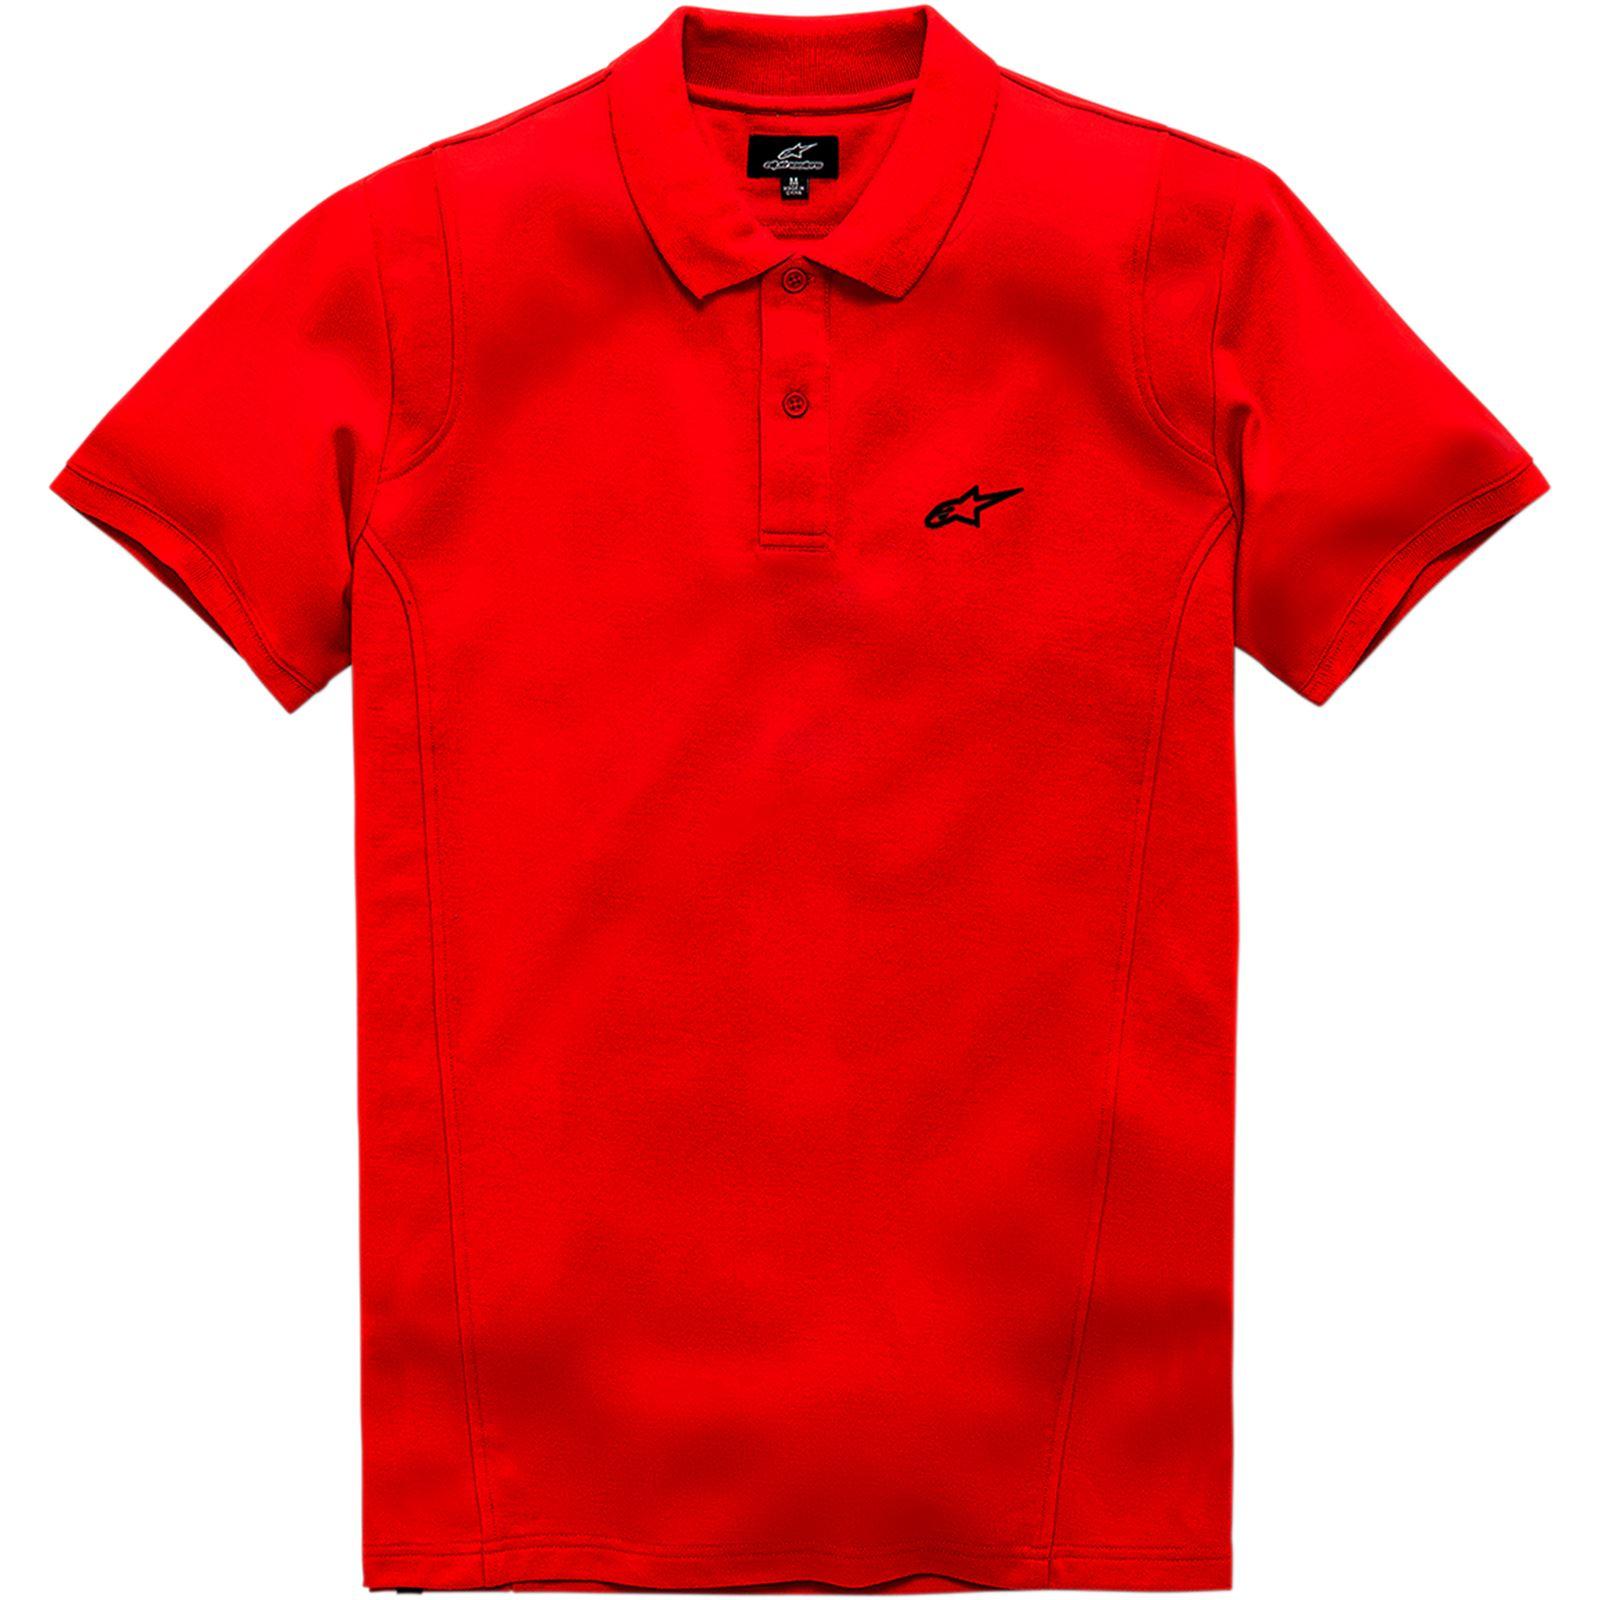 Alpinestars Capital Polo T-Shirt - Red - 2X-Large